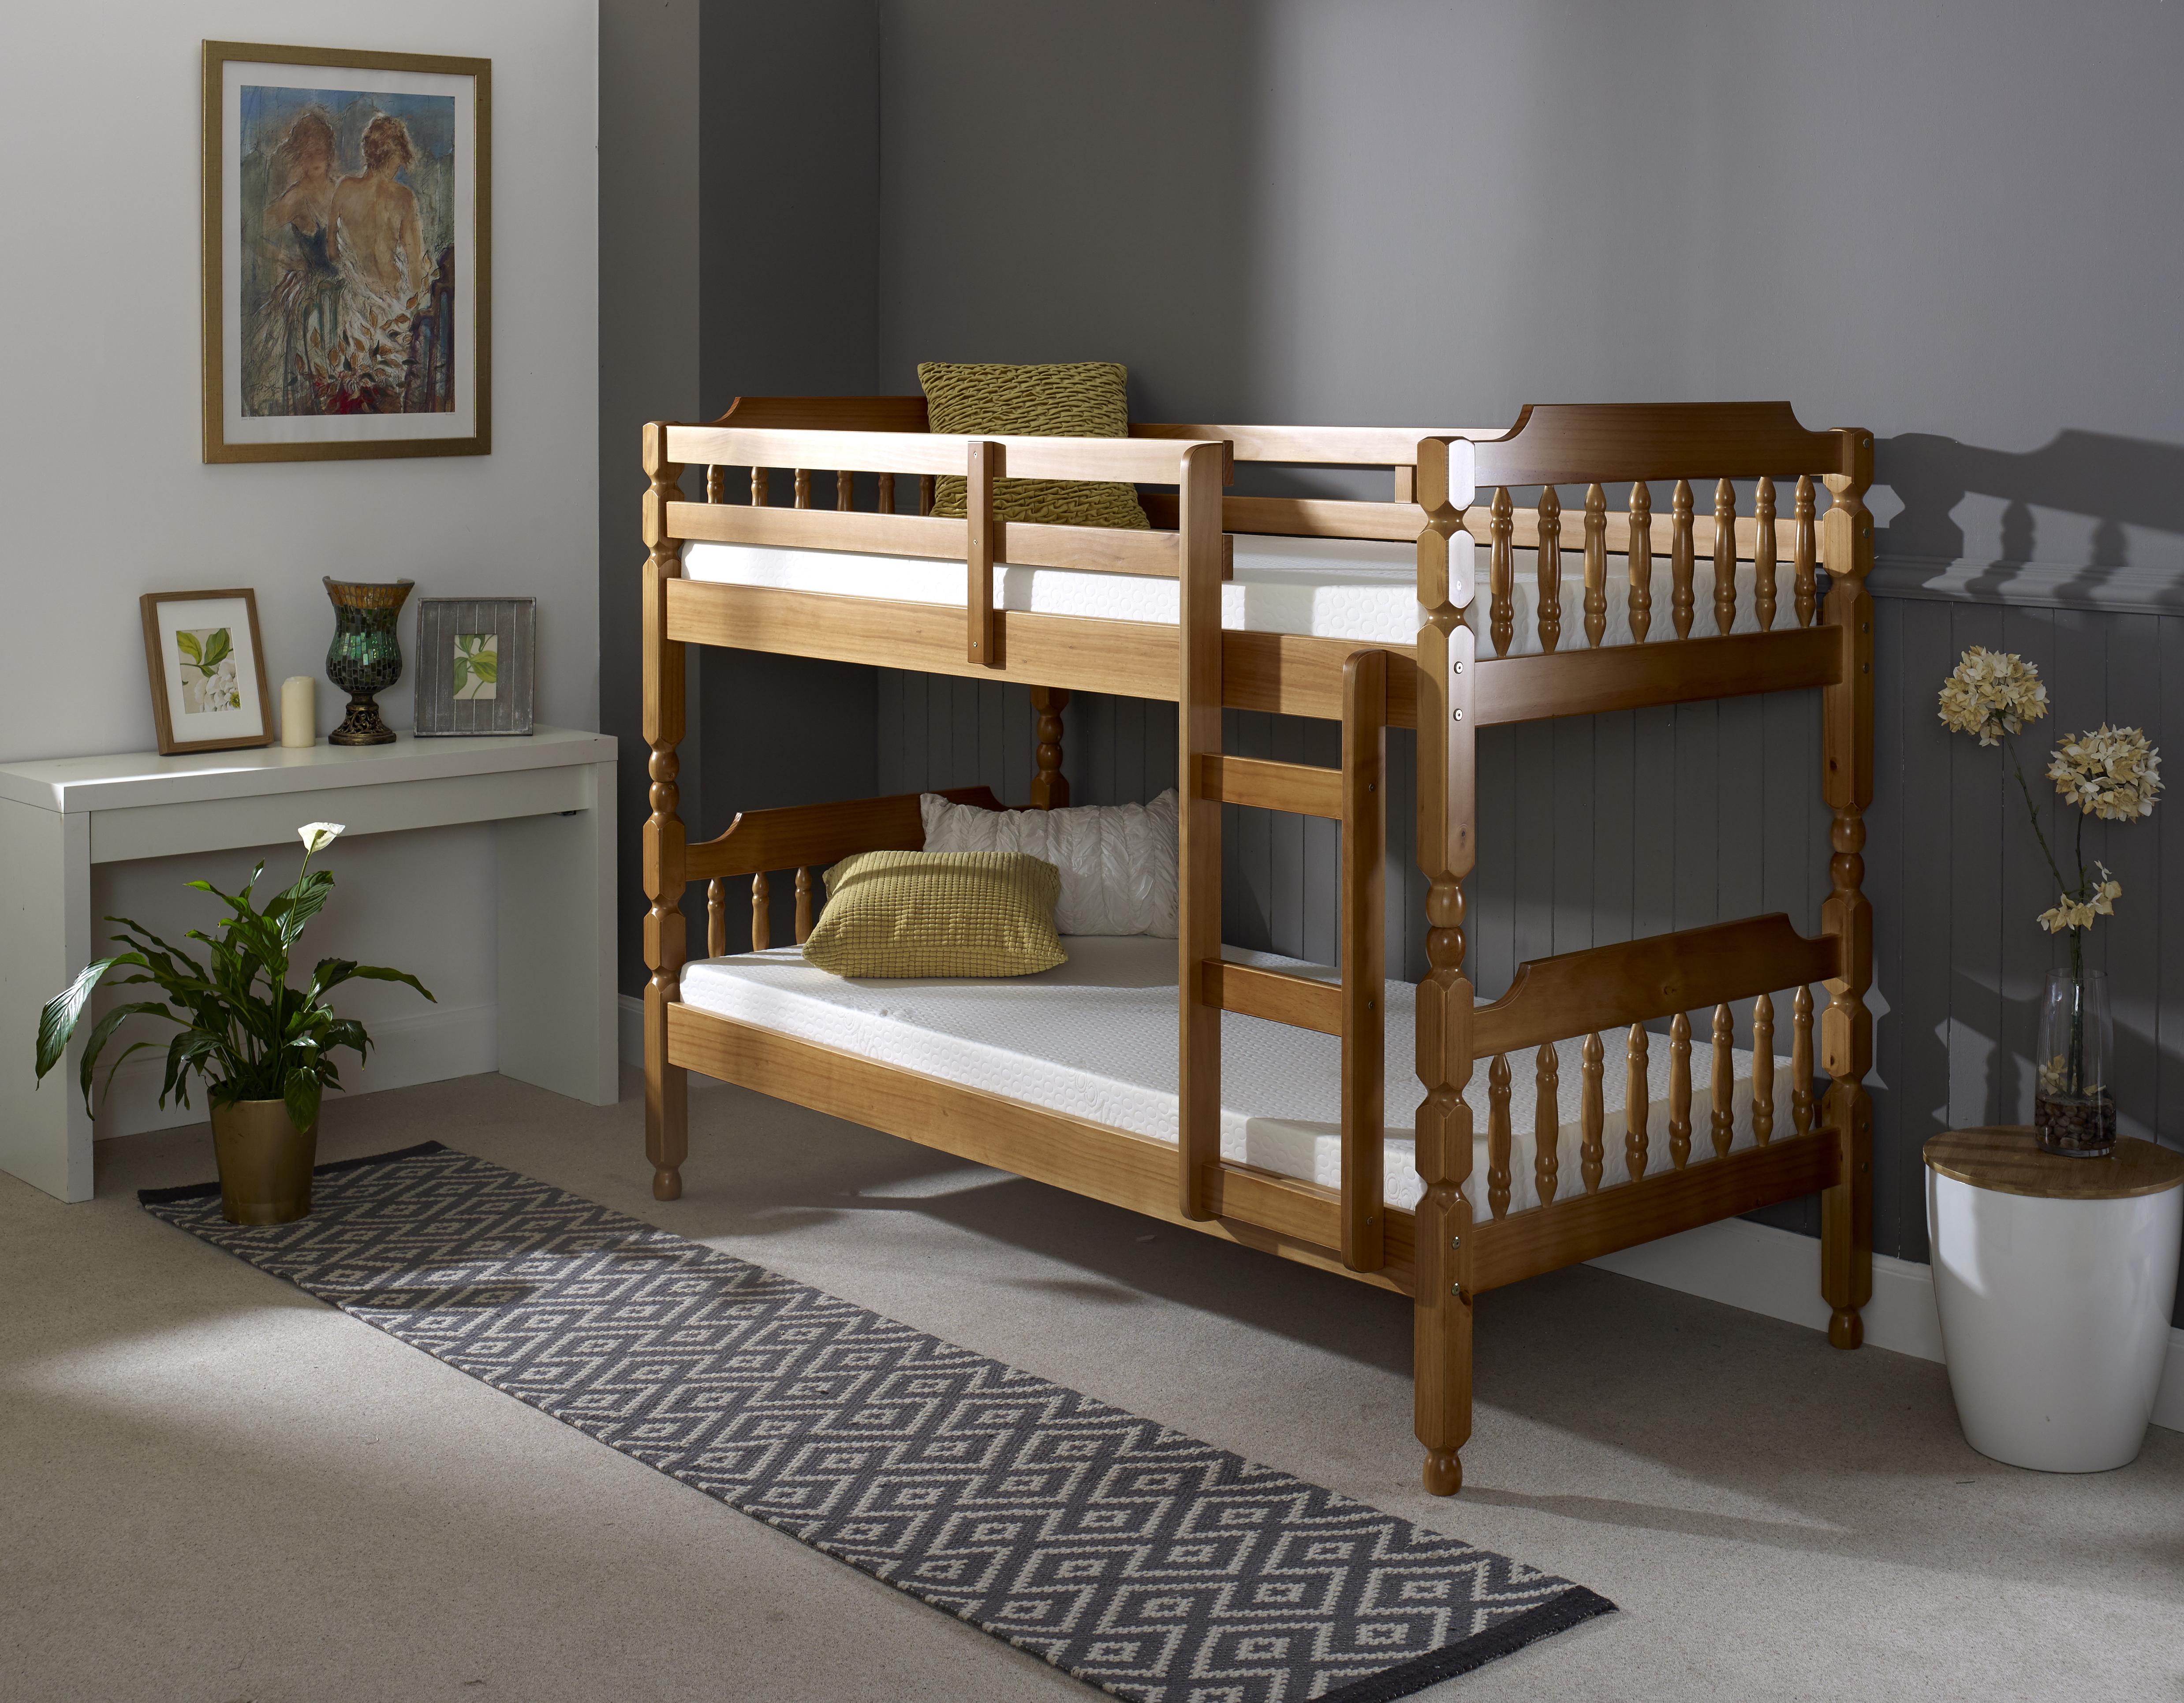 3'0 Colonial Bunk Bed Honey 1